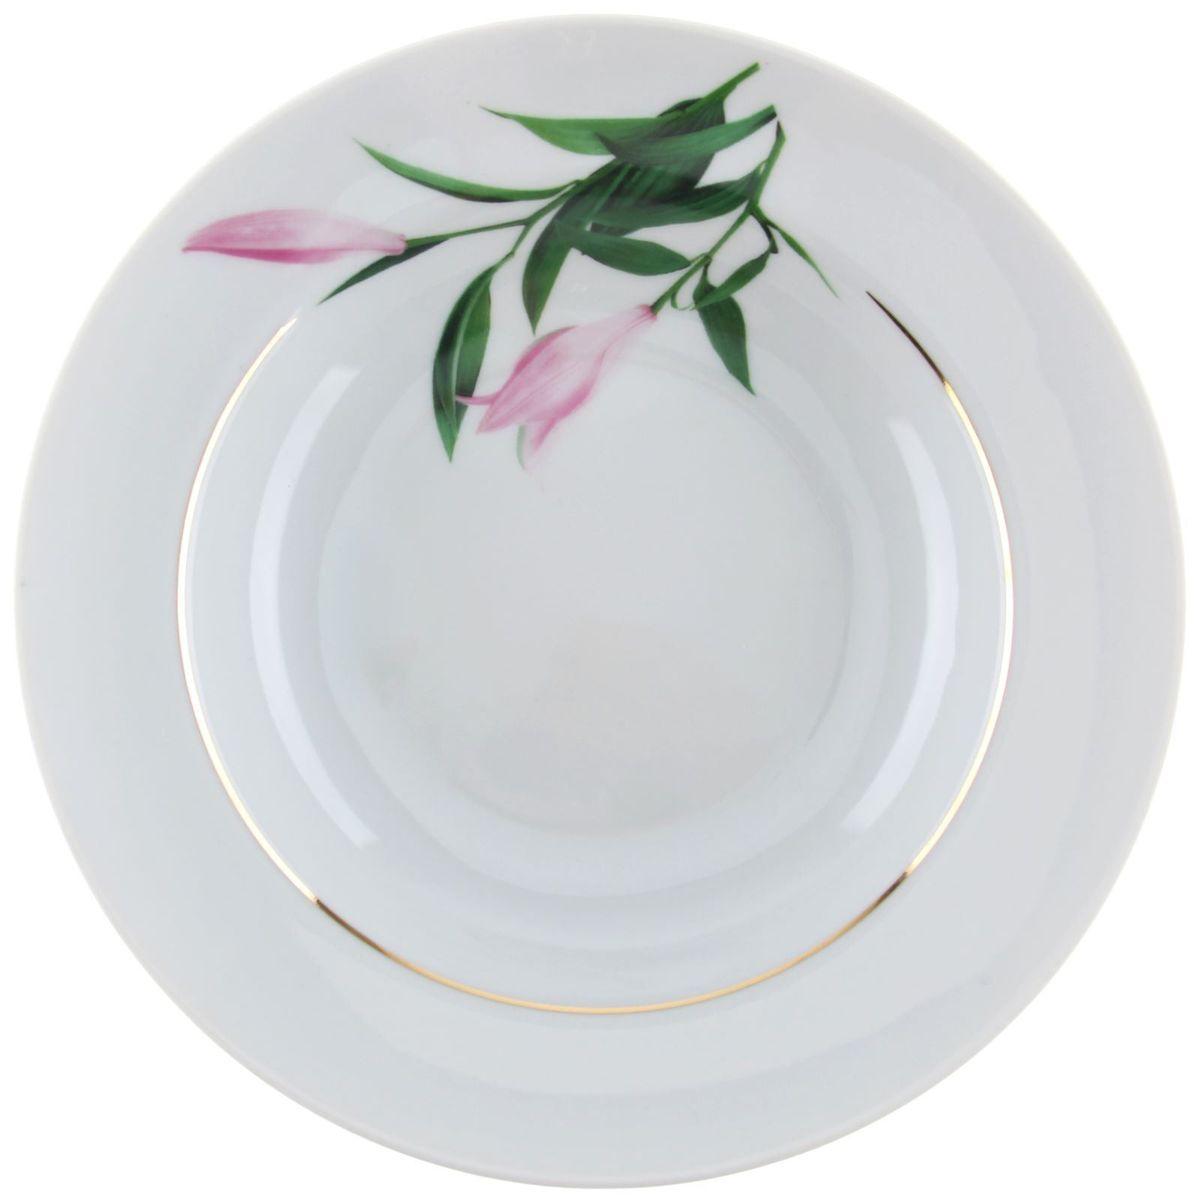 Тарелка глубокая Идиллия. Бутон, диаметр 24 см тарелка мелкая идиллия ромашка диаметр 20 см 5с0189